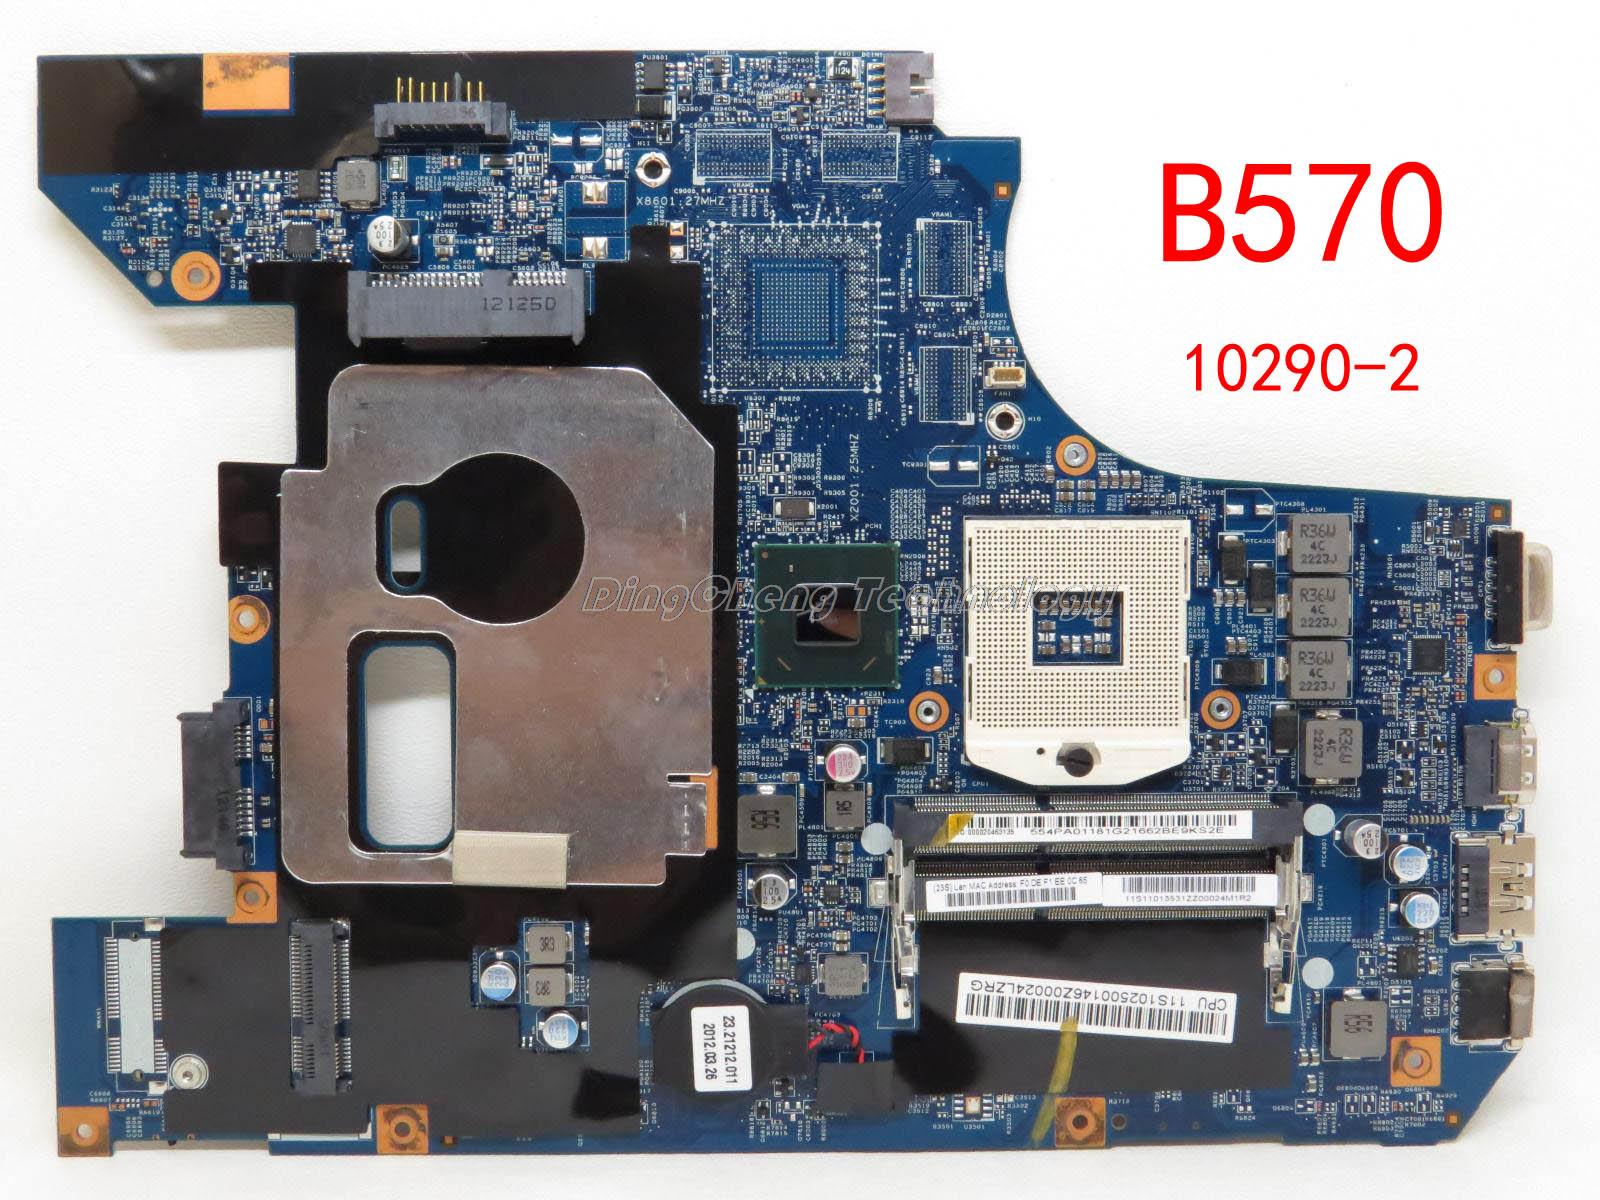 HOLYTIME laptop Motherboard For Lenovo B570 Z570 V570 48.4PA01.021 10290-2 HM65 integrated graphics card DDR3